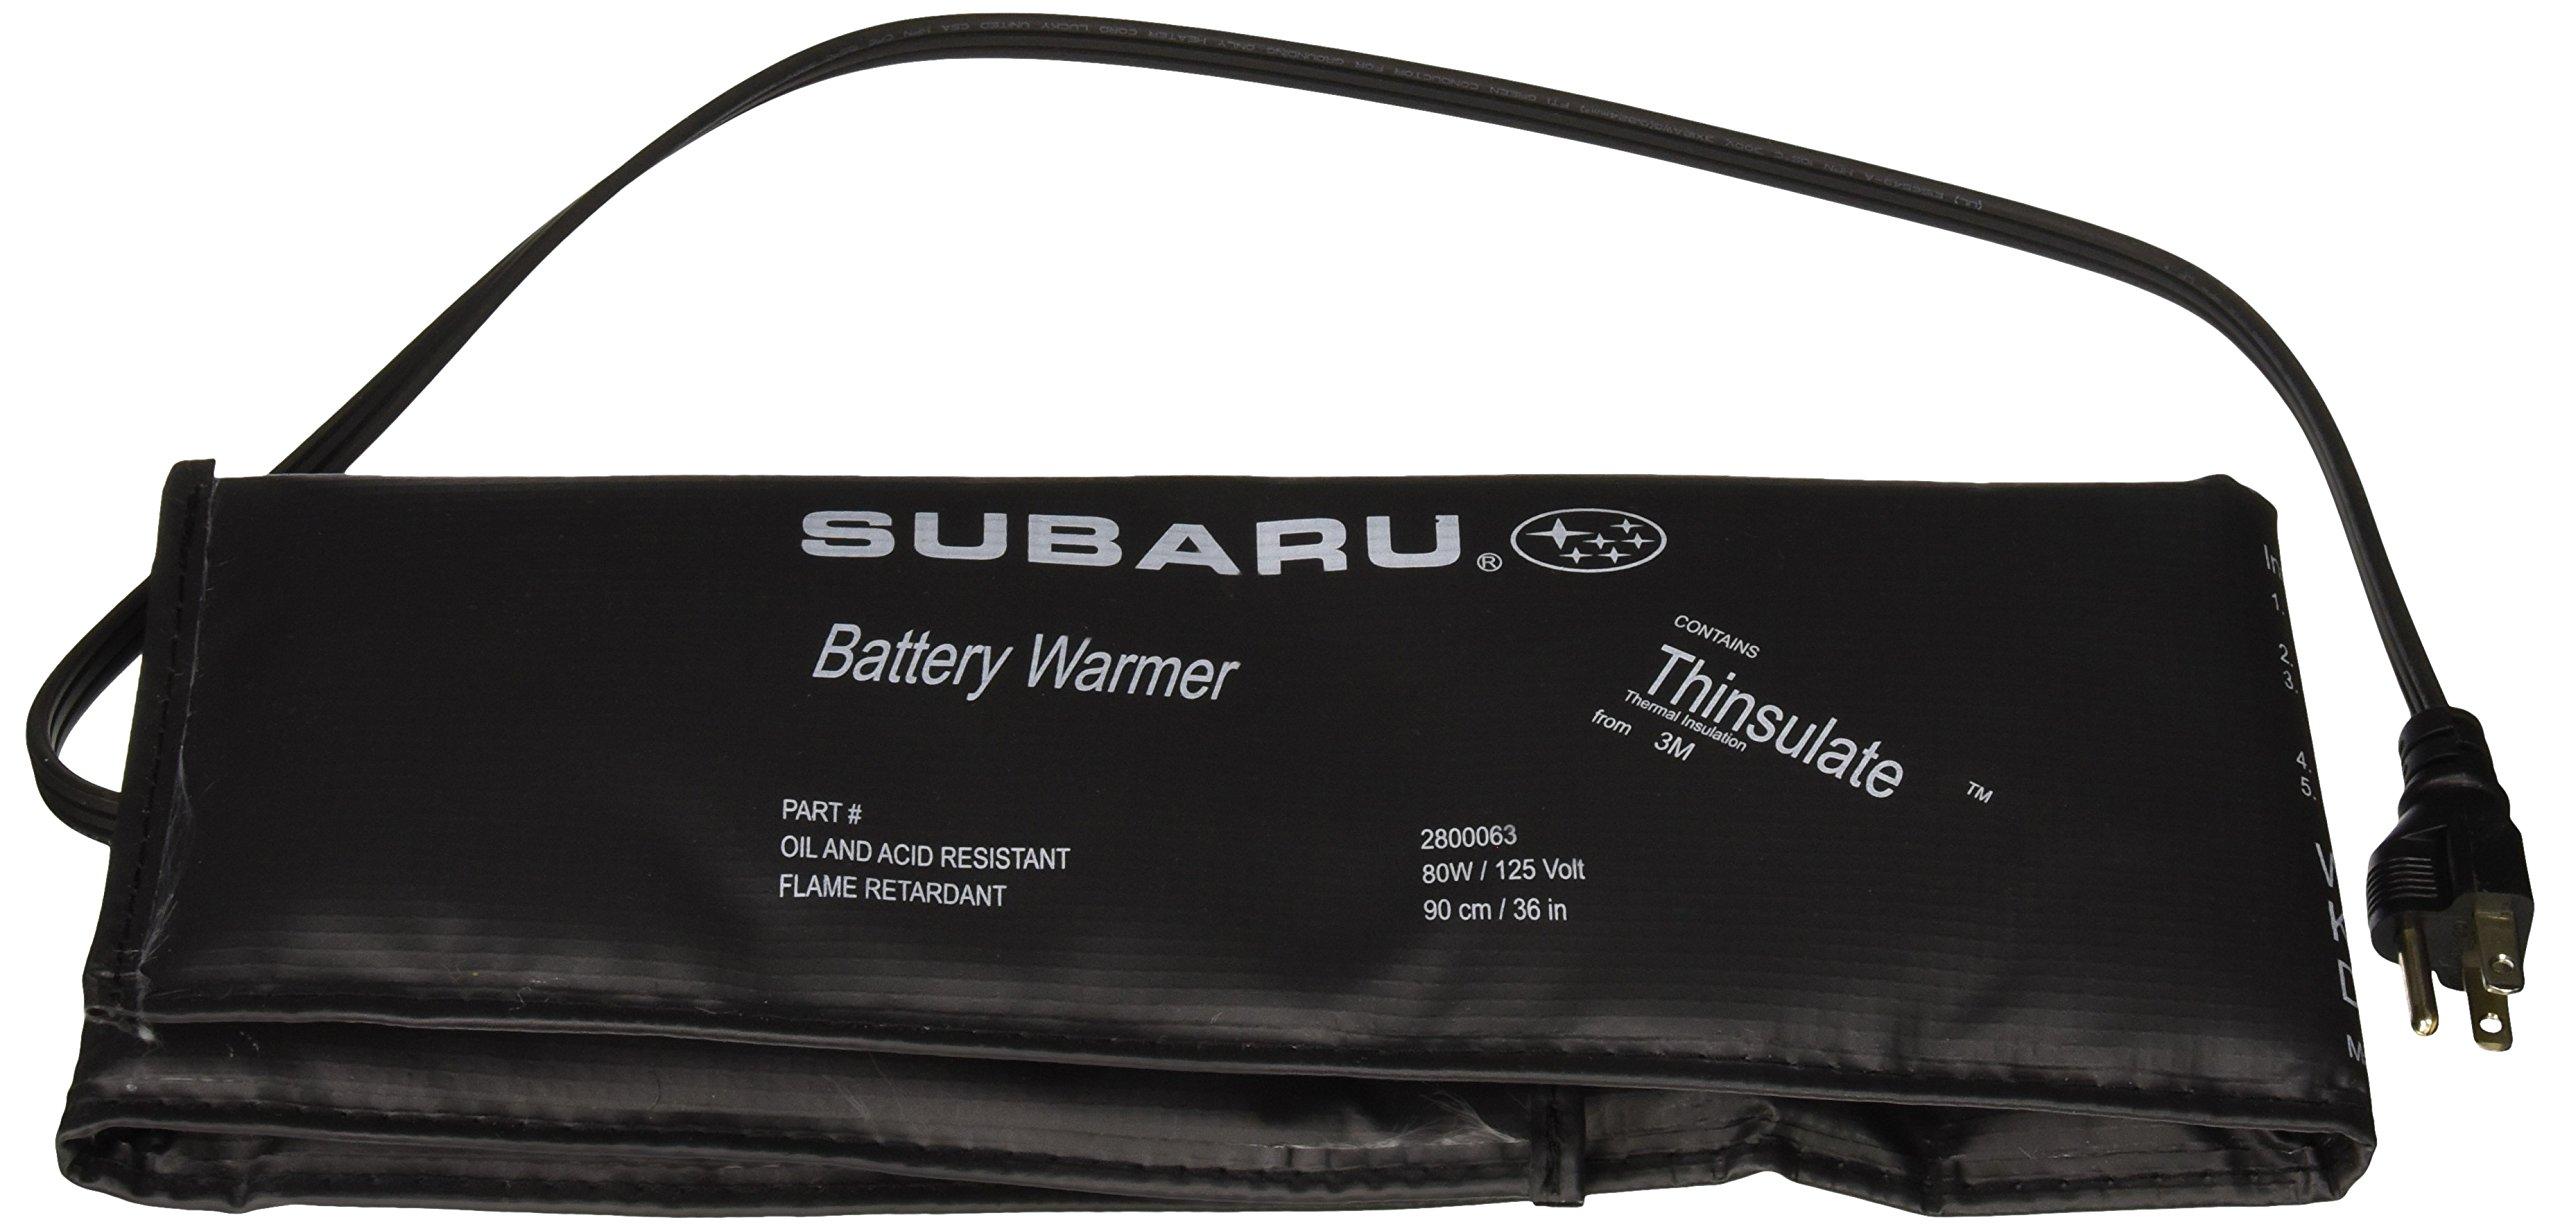 Genuine Subaru J6010FS000 Battery Warmer by SUBARU